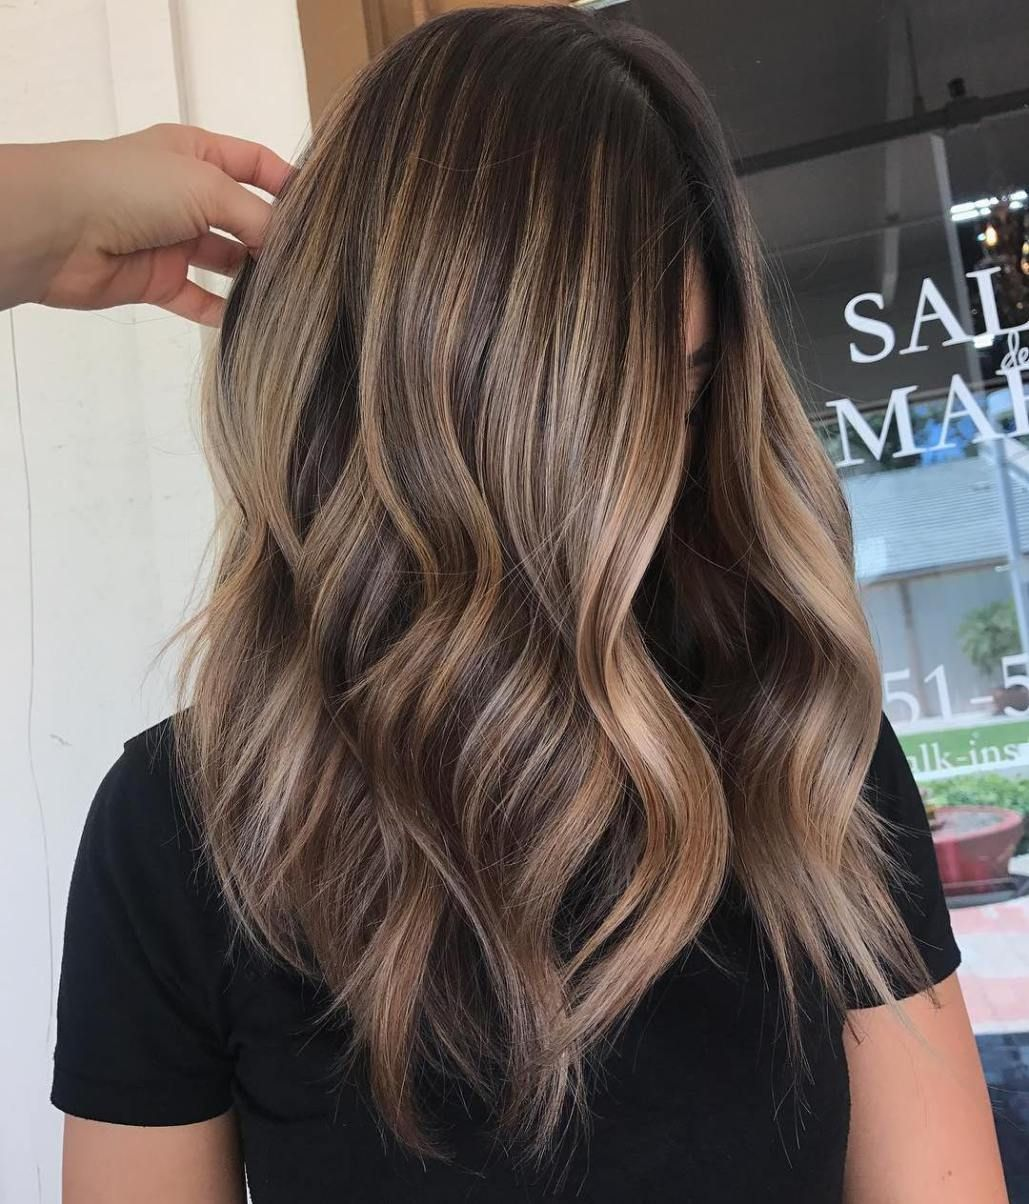 70 Flattering Balayage Hair Color Ideas For 2020 Balayage Frisuren Balayage Frisur